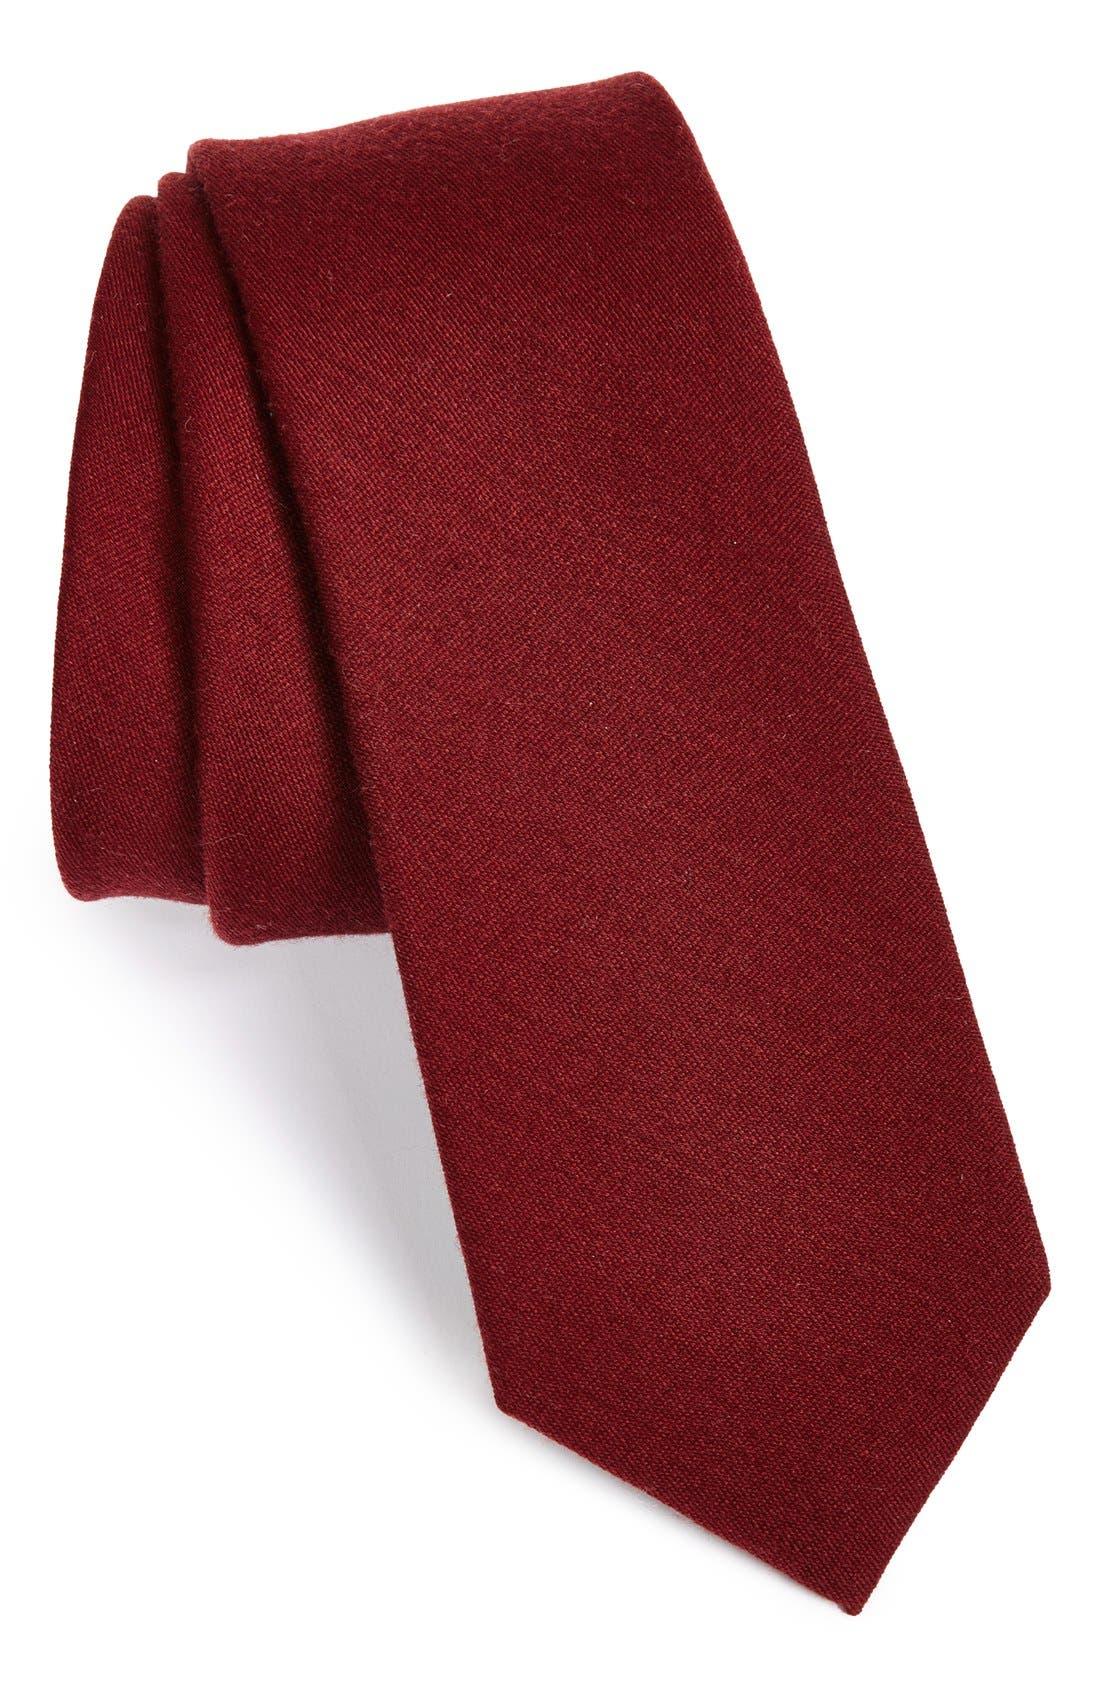 Wool & Silk Solid Tie,                             Main thumbnail 1, color,                             BURGUNDY